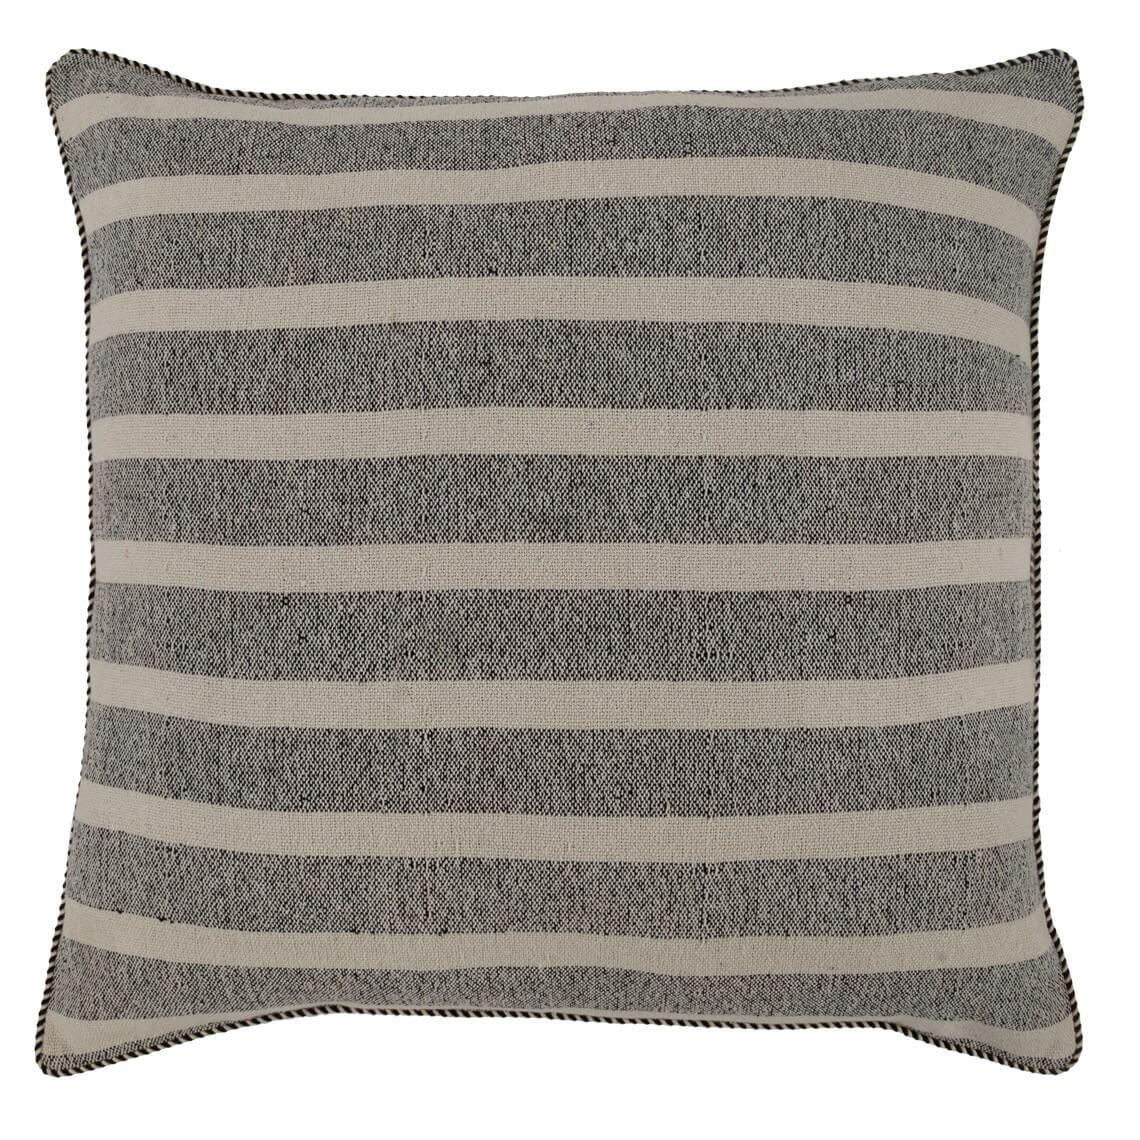 August Cushion Size W 80cm x D 80cm x H 15cm in Grey/White Freedom